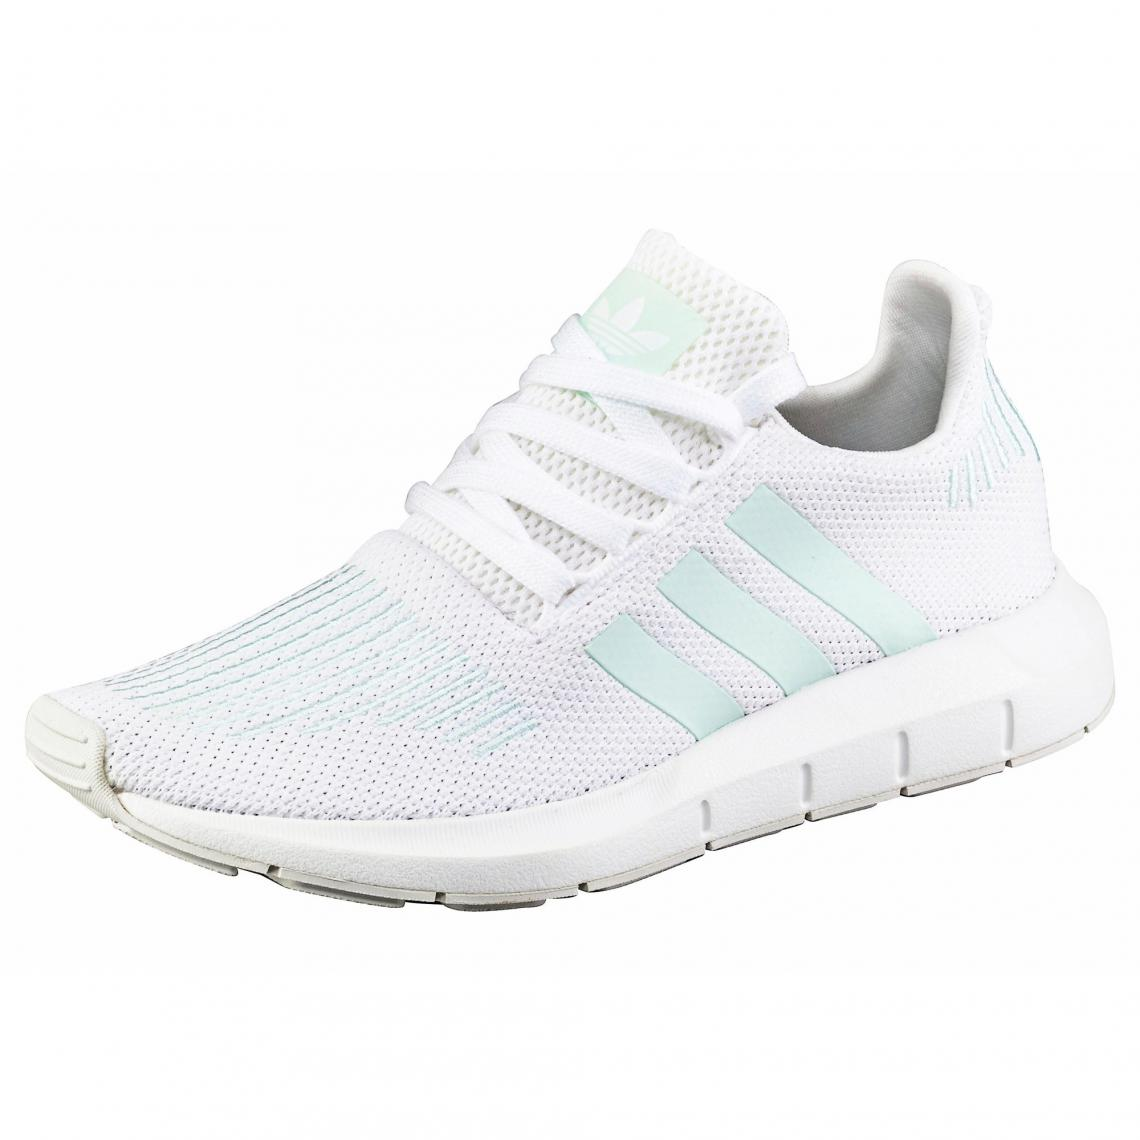 39664fda3d adidas Originals Swift Run chaussures running femme - Blanc - Menthe Adidas  Originals Femme